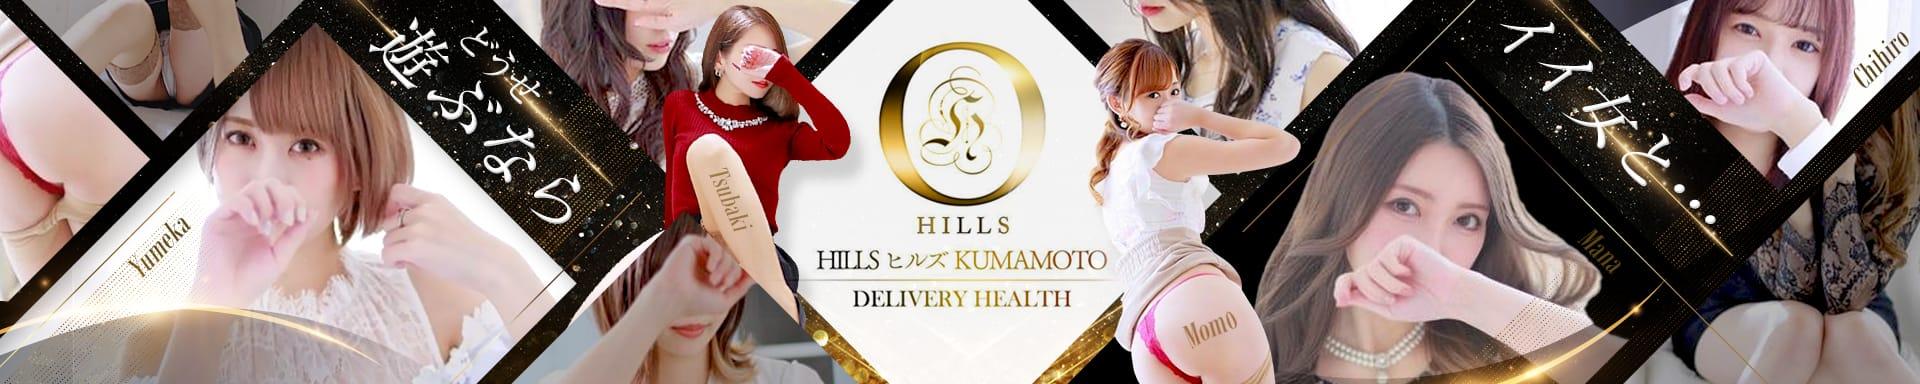 Hills Kumamoto ヒルズ熊本